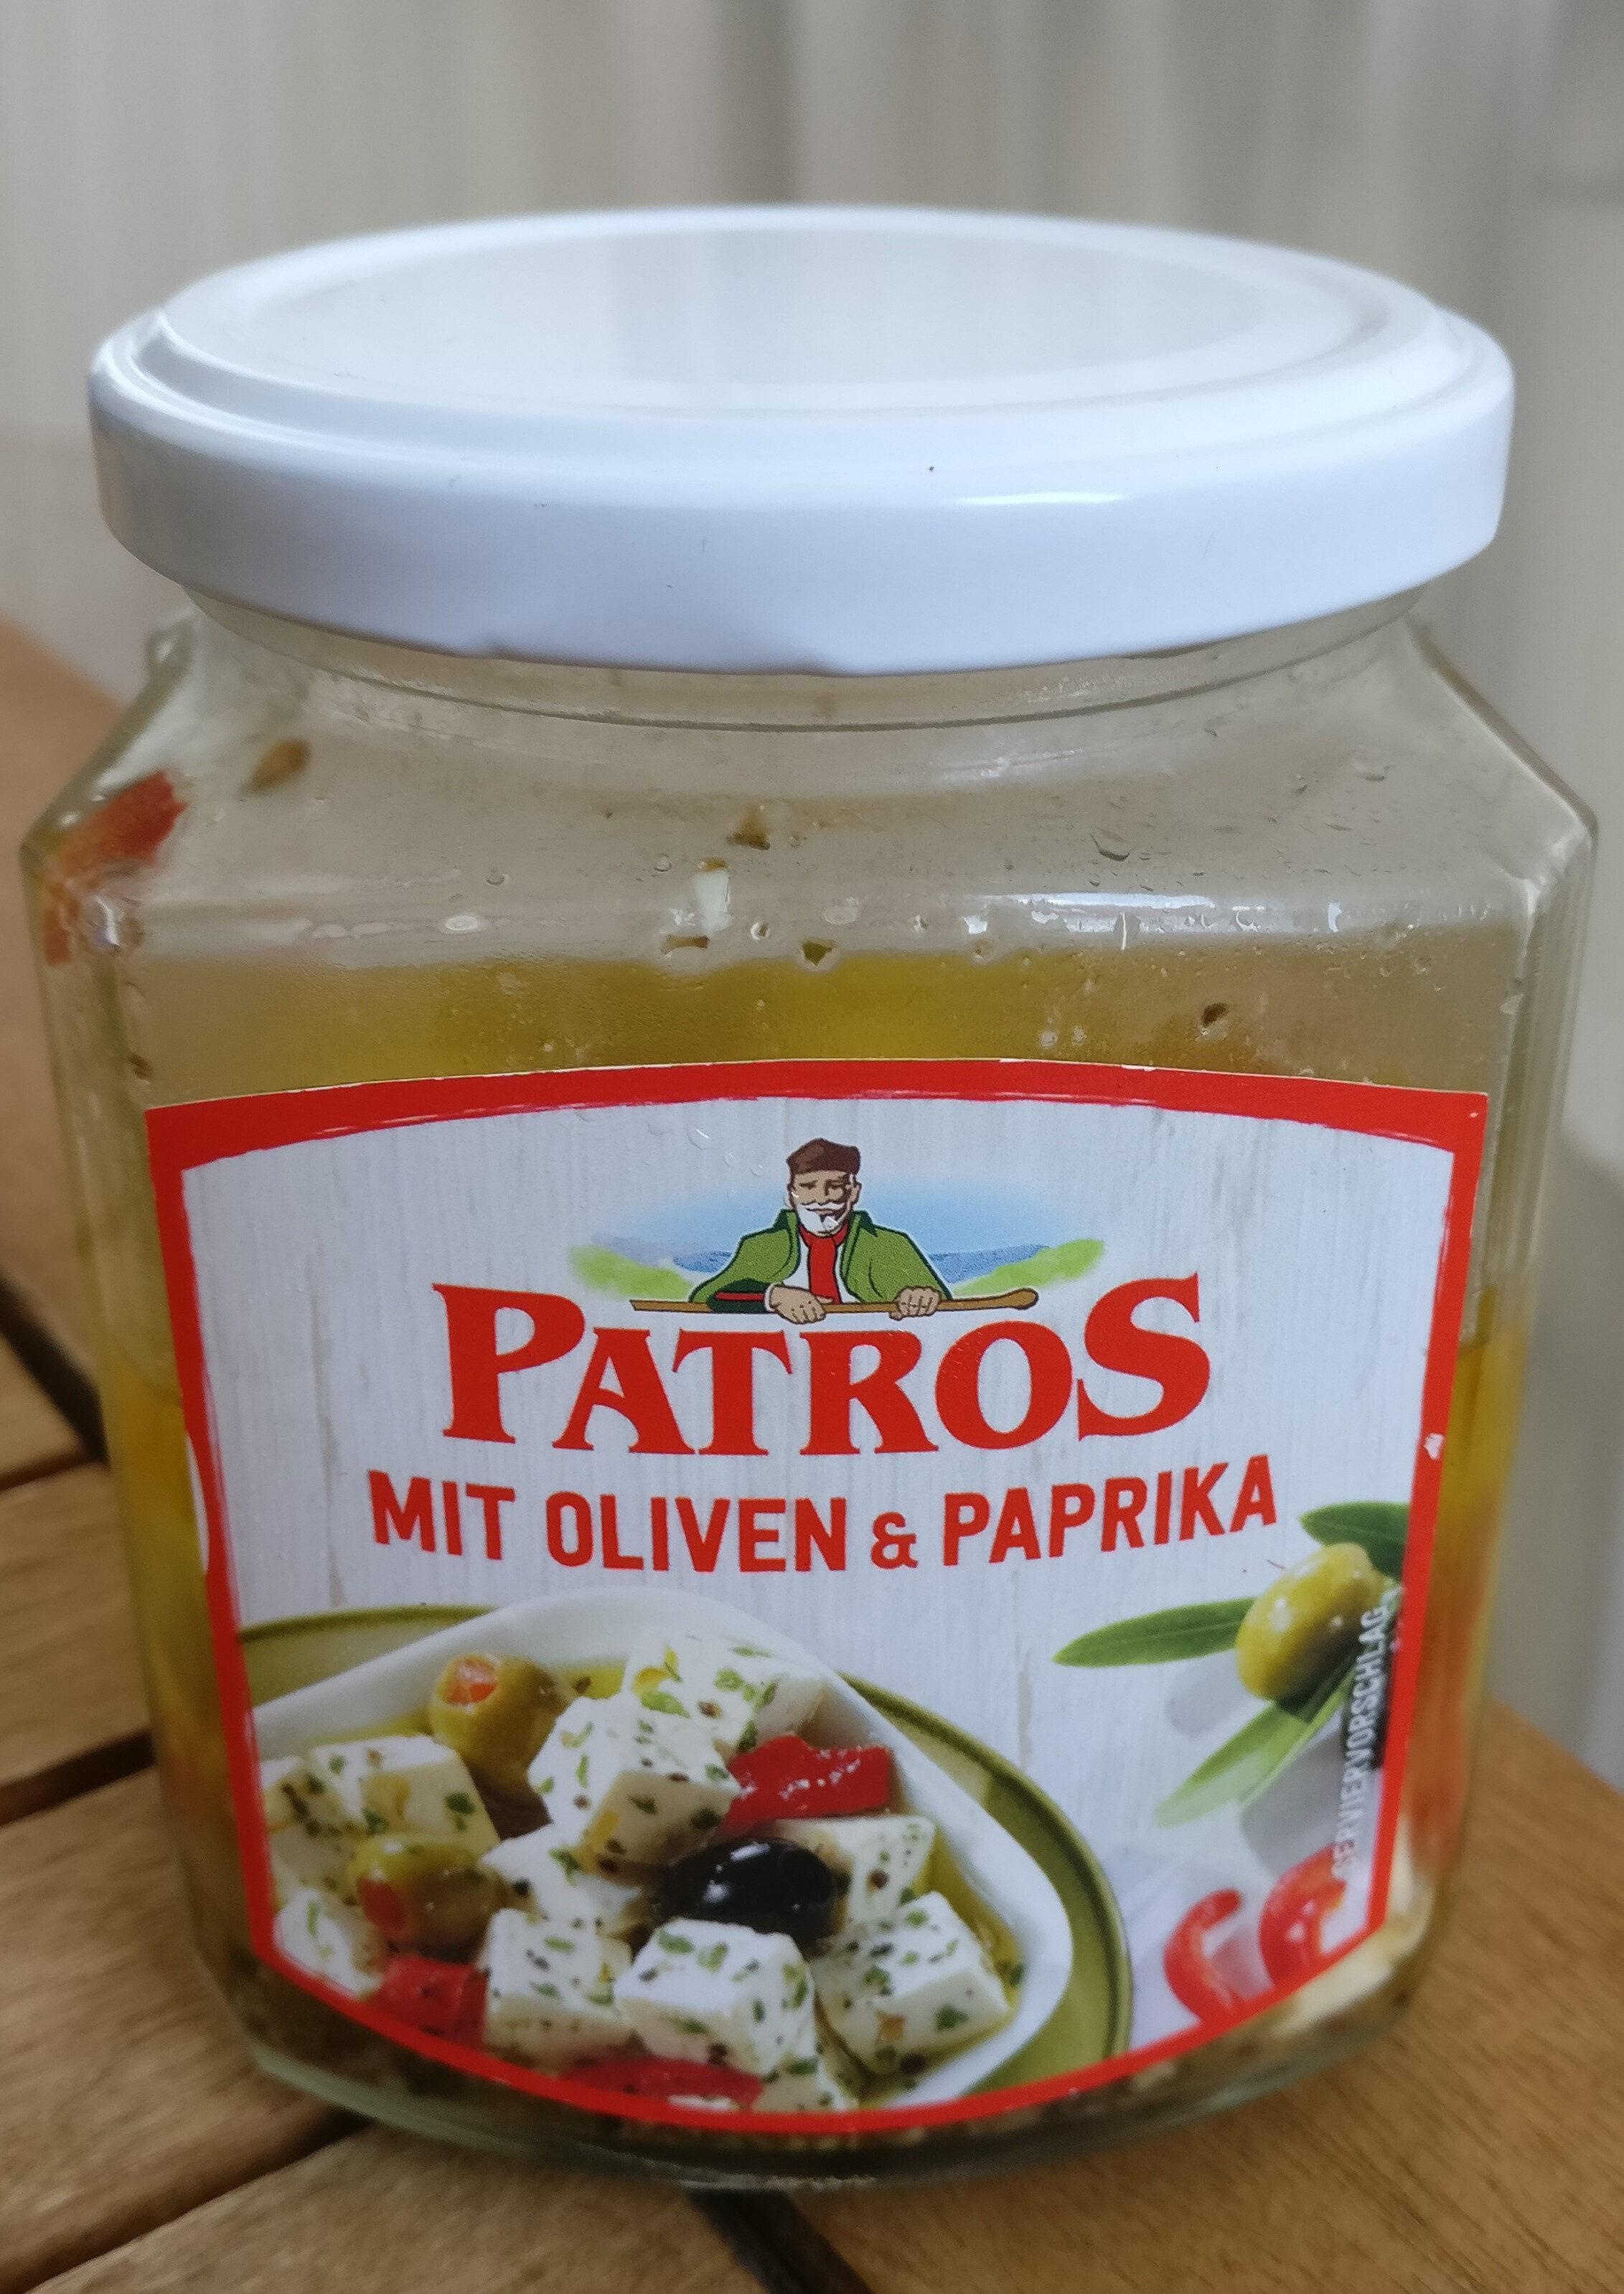 Patros mit Oliven & Paprika - Produit